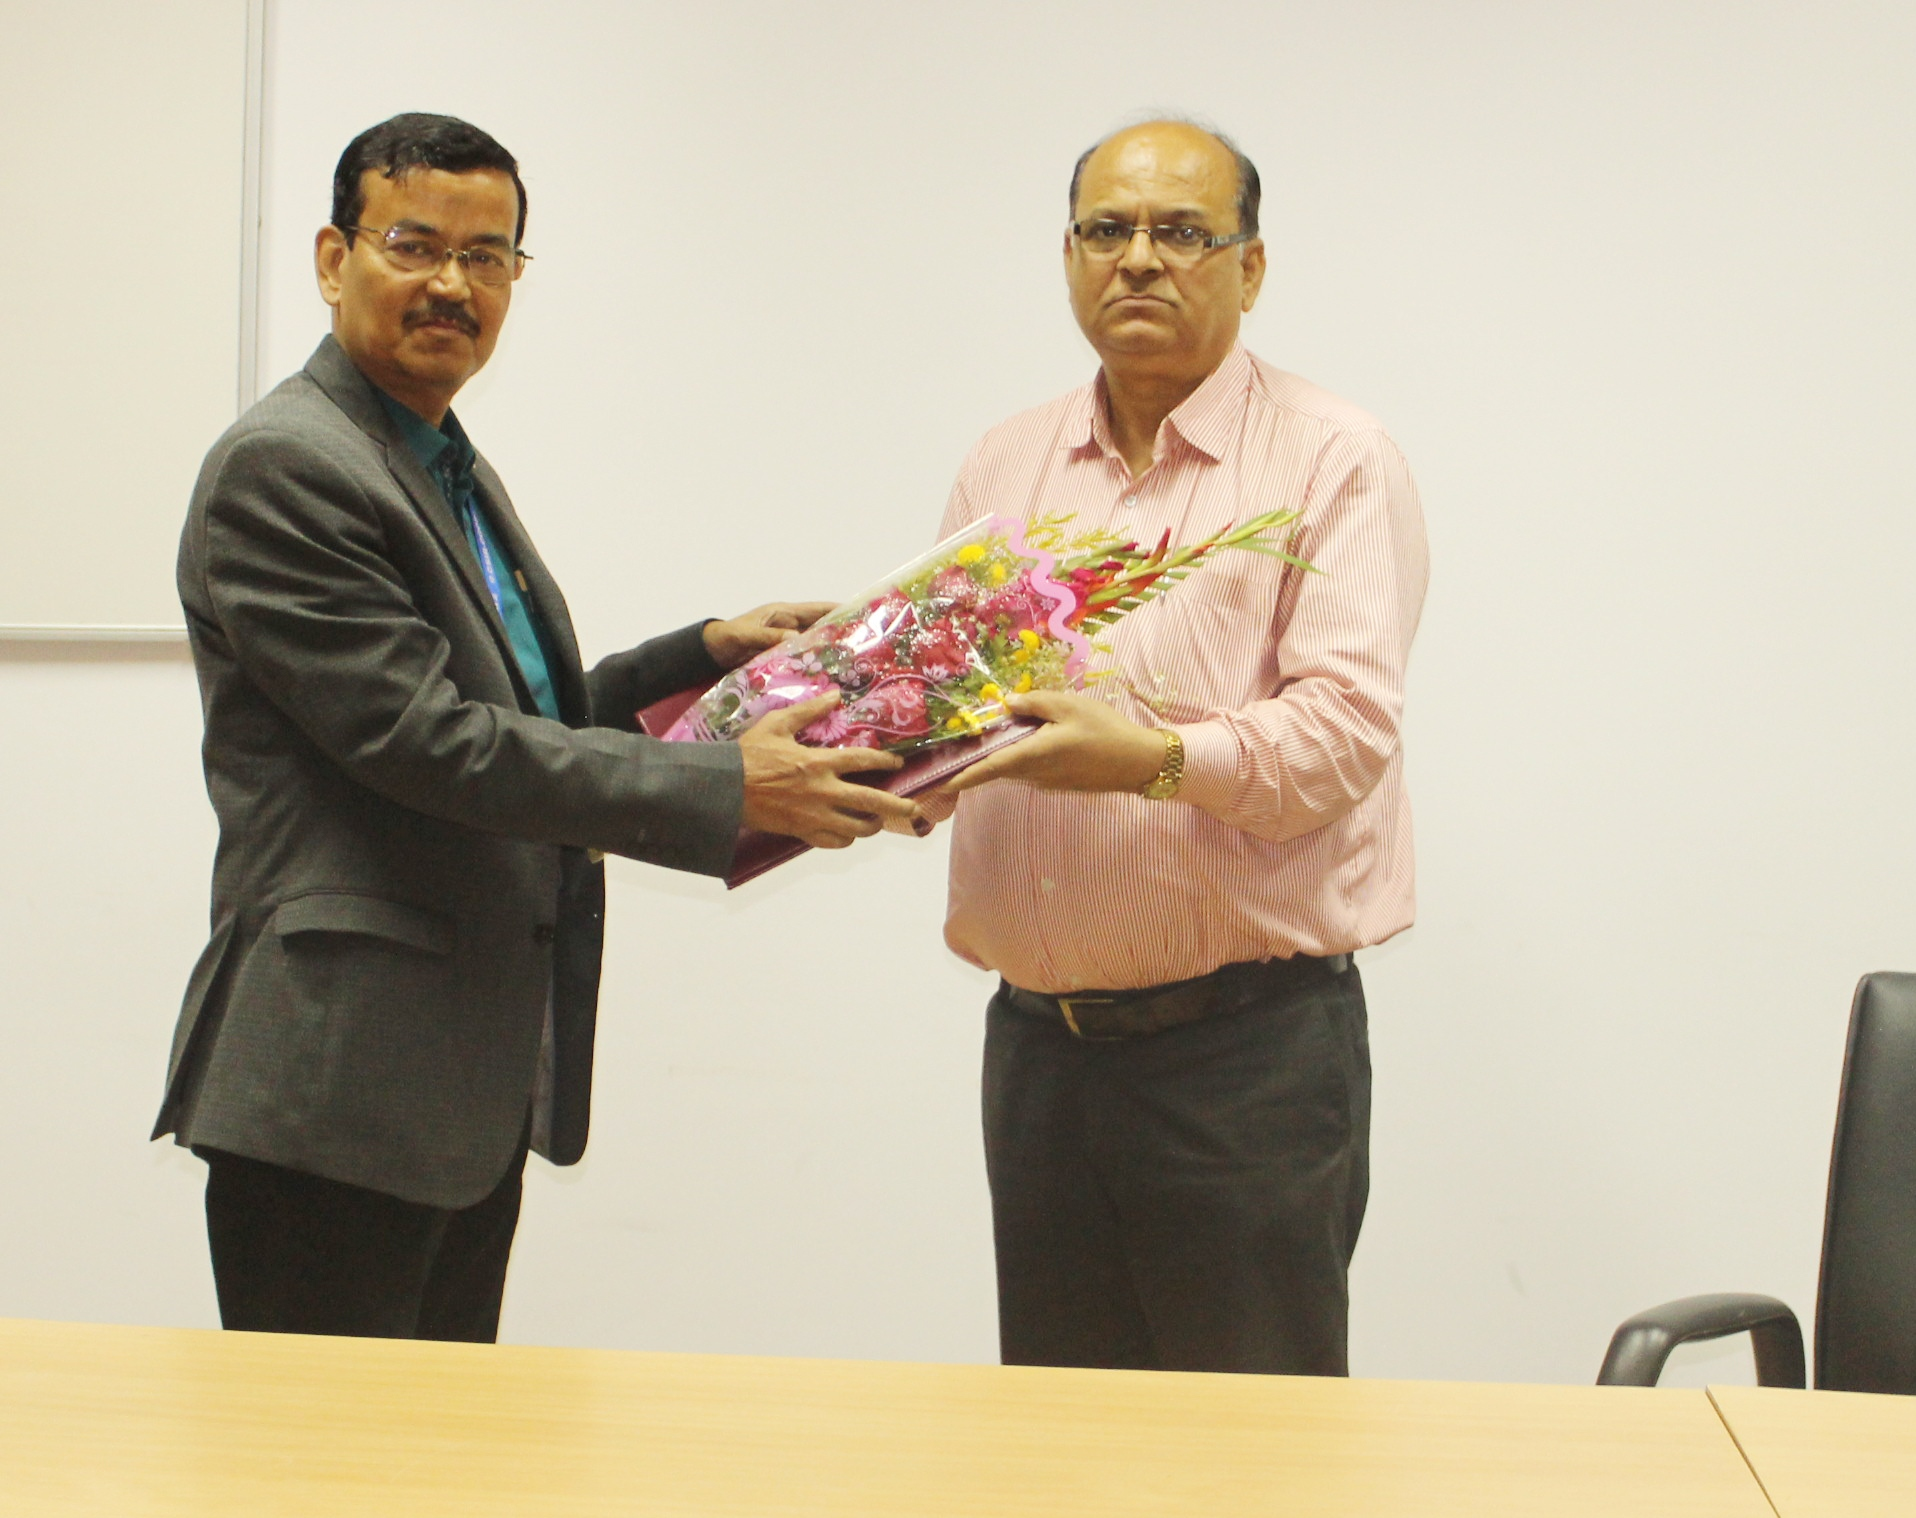 Superannuation of Shri Indra Kant Jha, Senior Technician(2) from Council Service on 31.01.2020